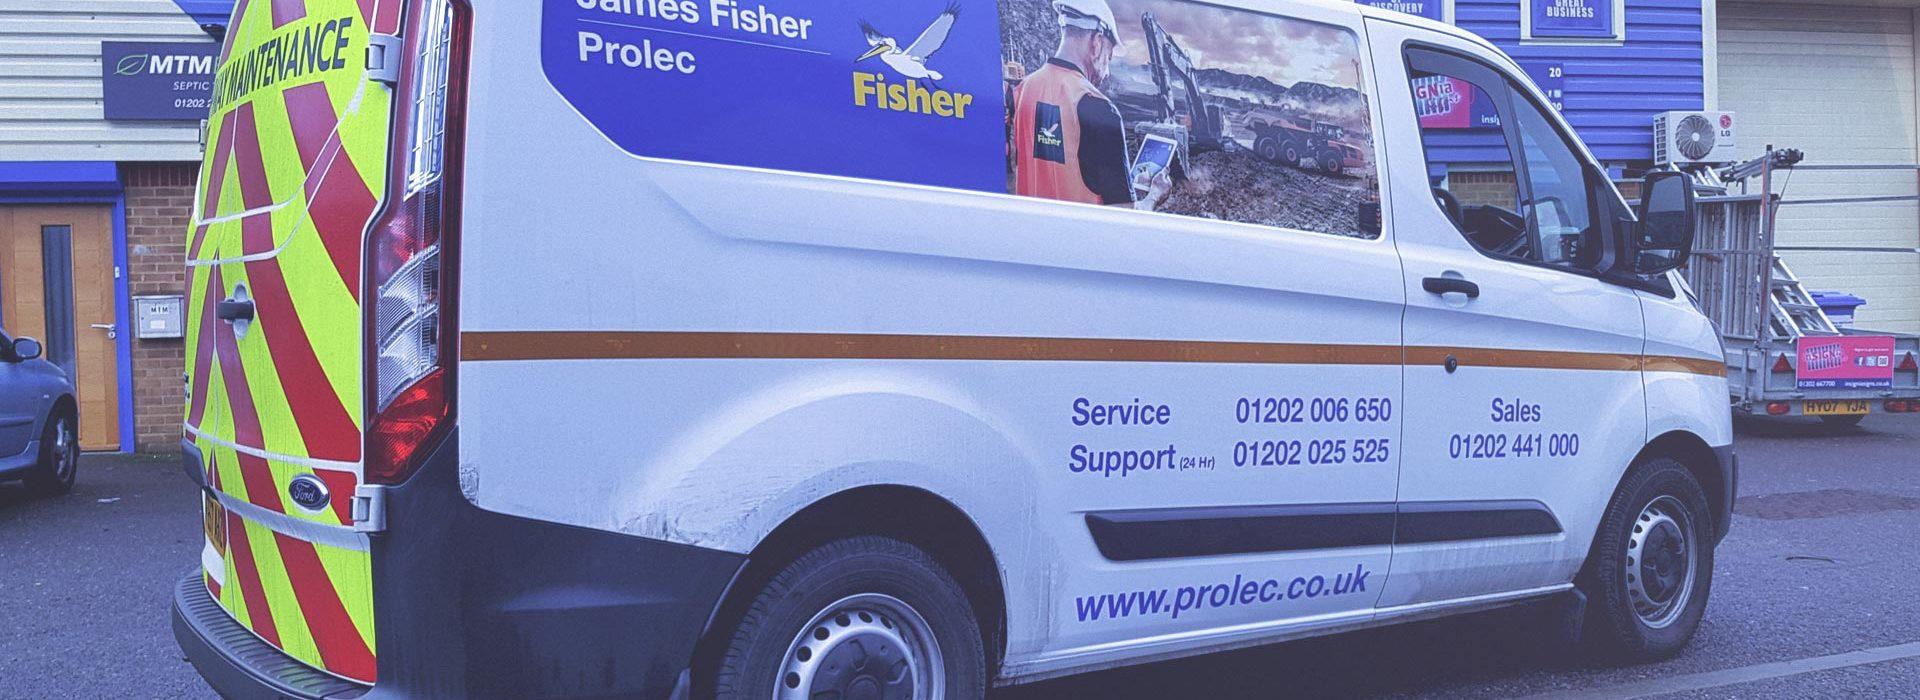 Portfolio - James Fisher Prolec Vehicle Wrapping